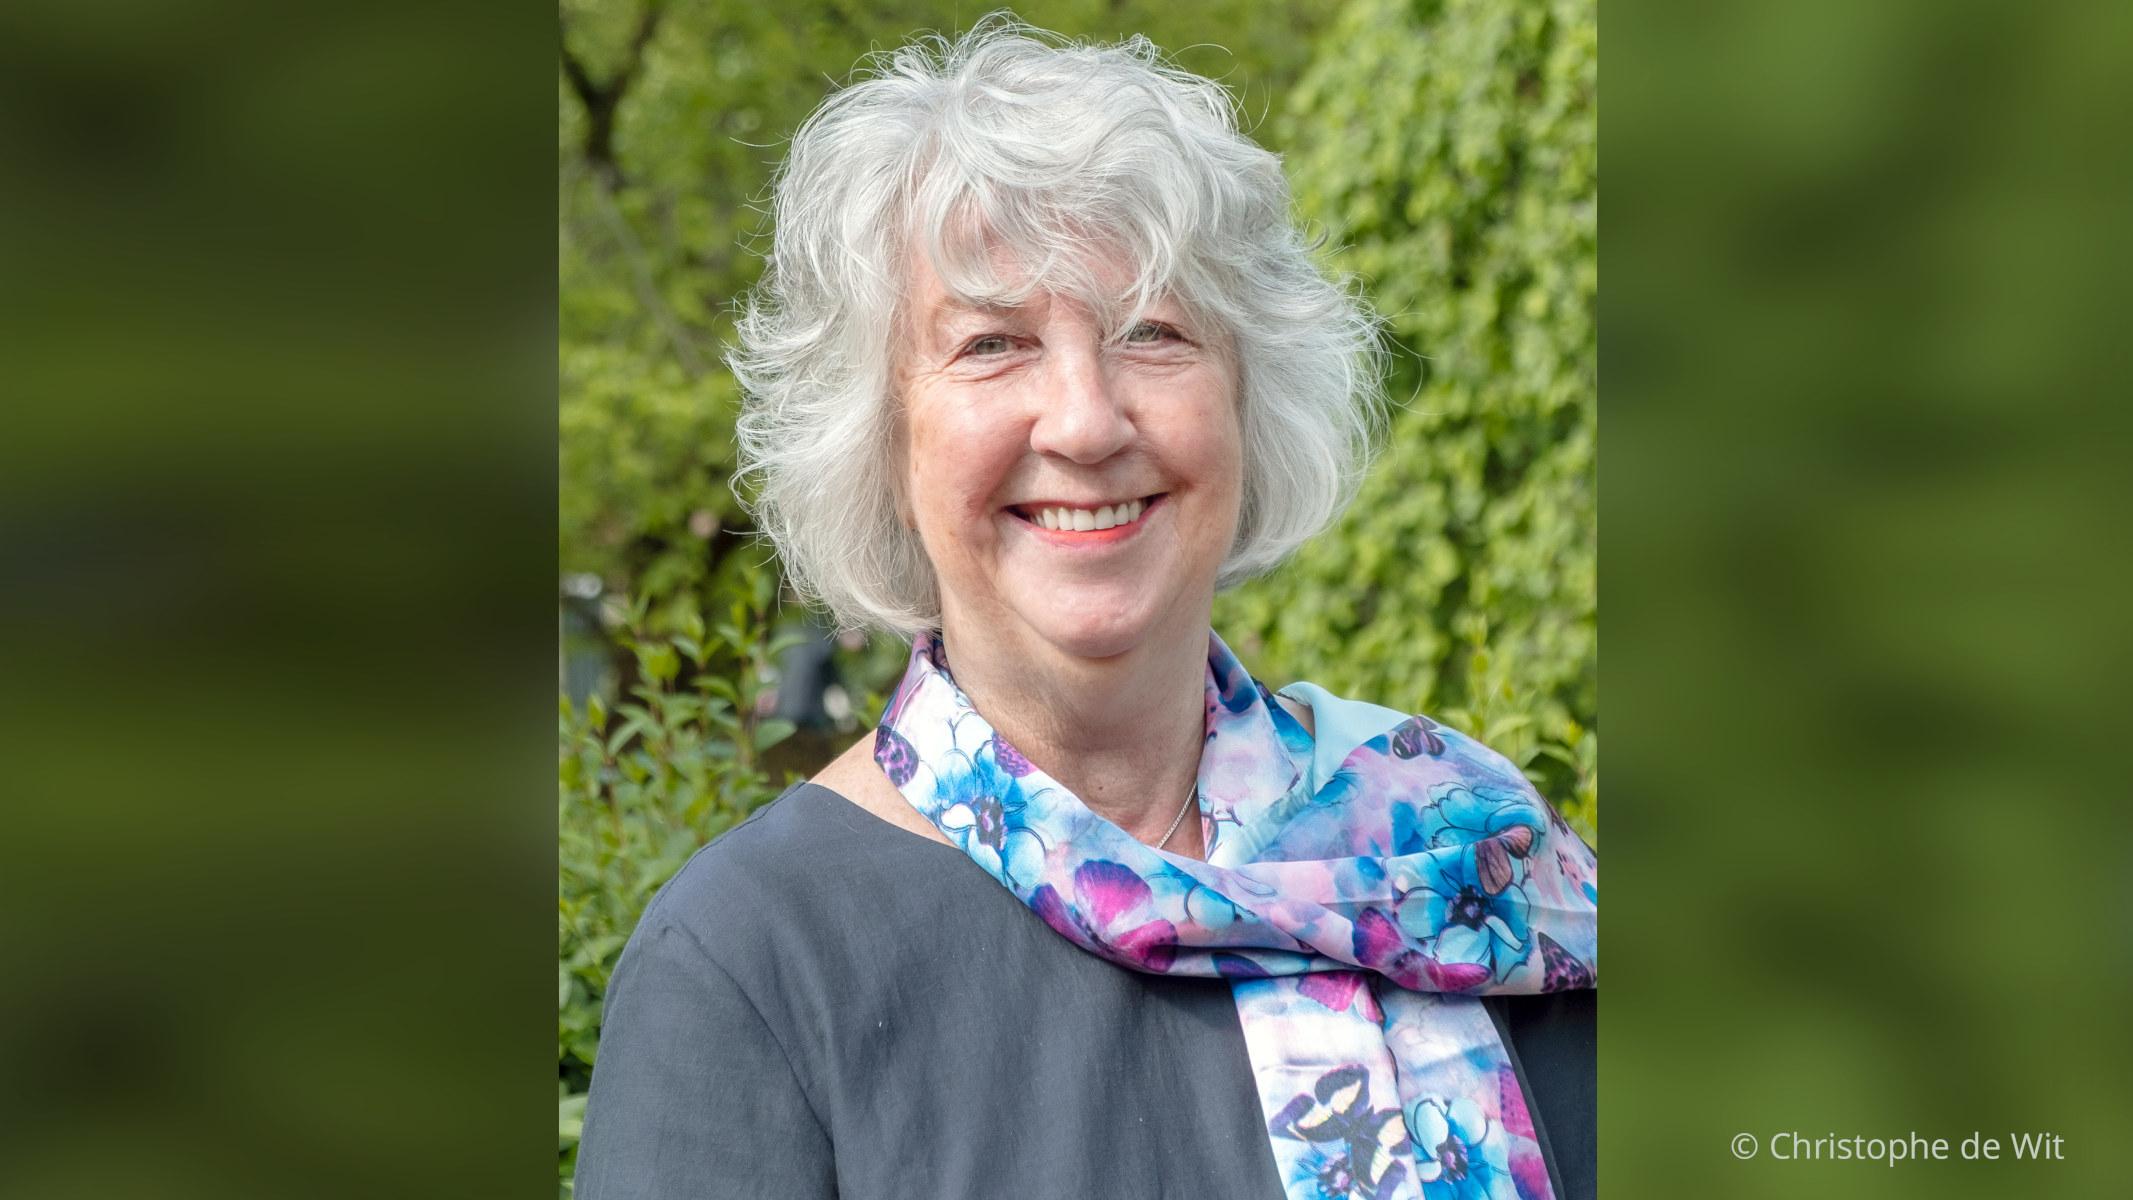 Diane Broeckhoven